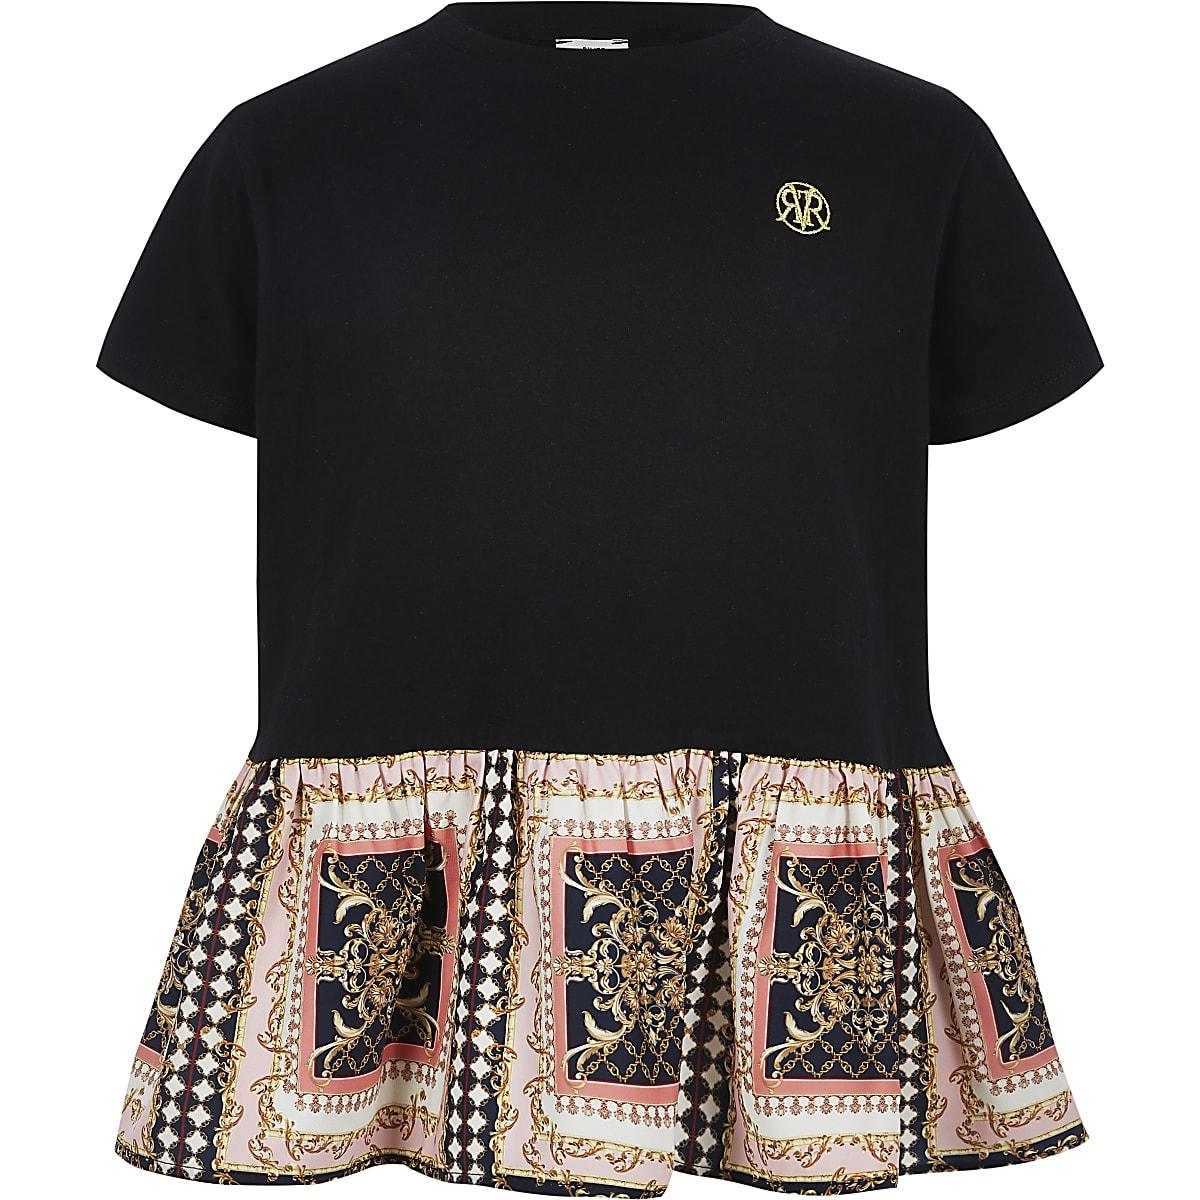 Girls black baroque peplum hem T-shirt